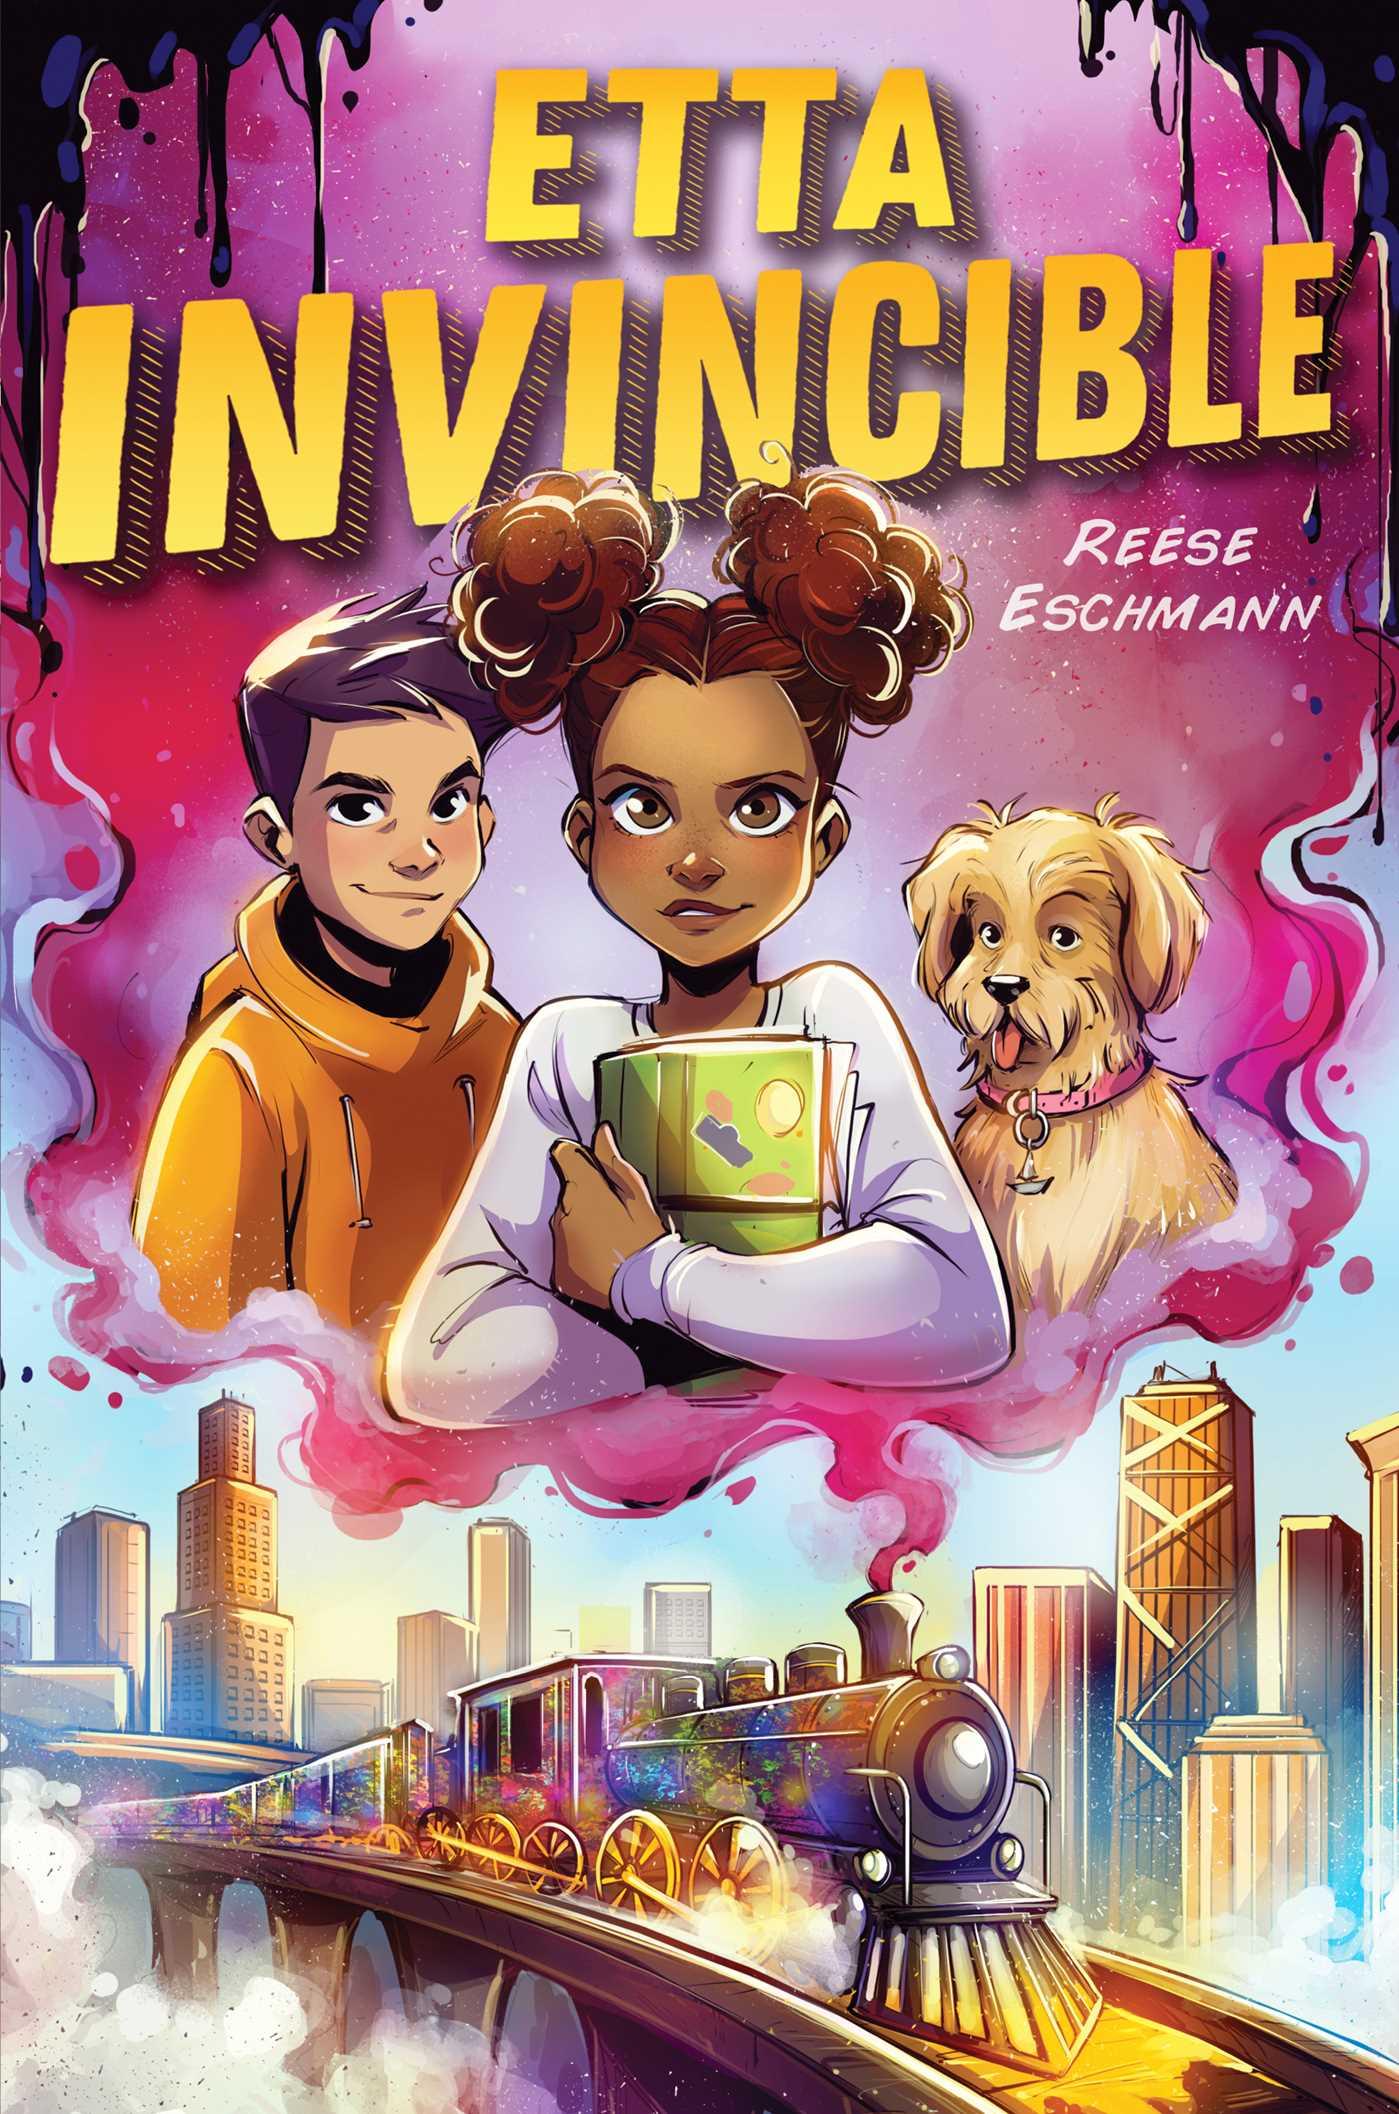 Etta Invincible By Reese Eschmann Release Date? 2021 Debut Releases